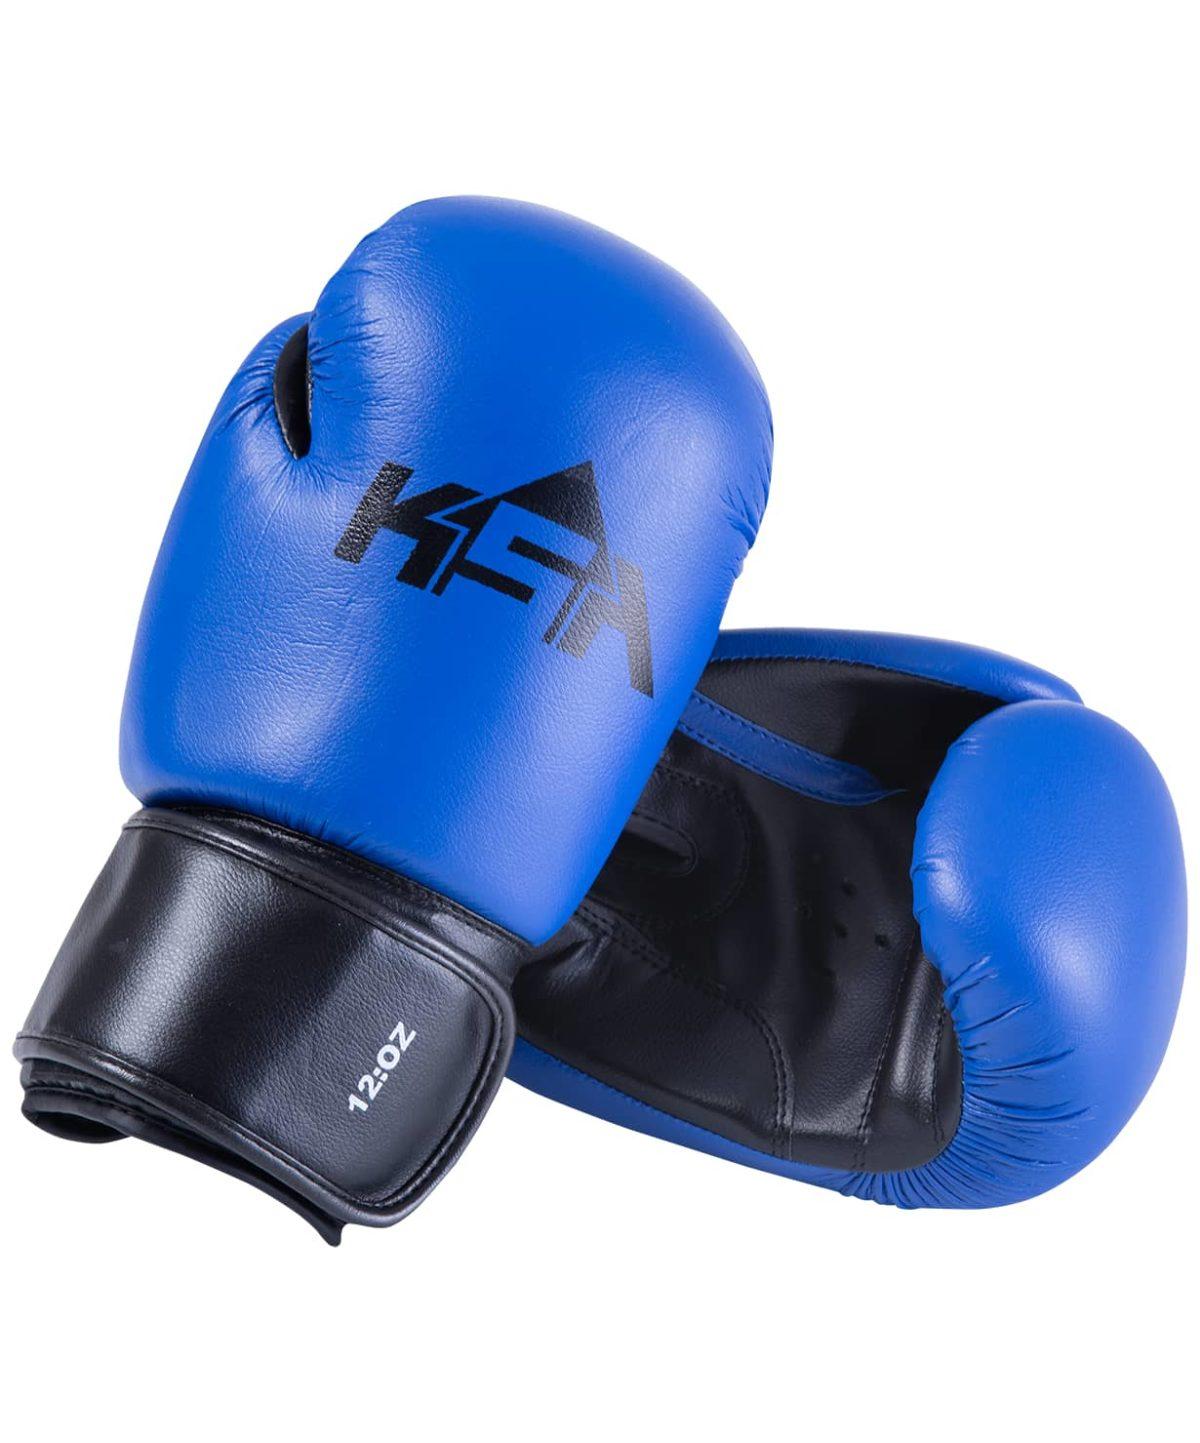 KSA Spider Blue Перчатки боксерские, 8 oz, к/з 17805: синий - 1